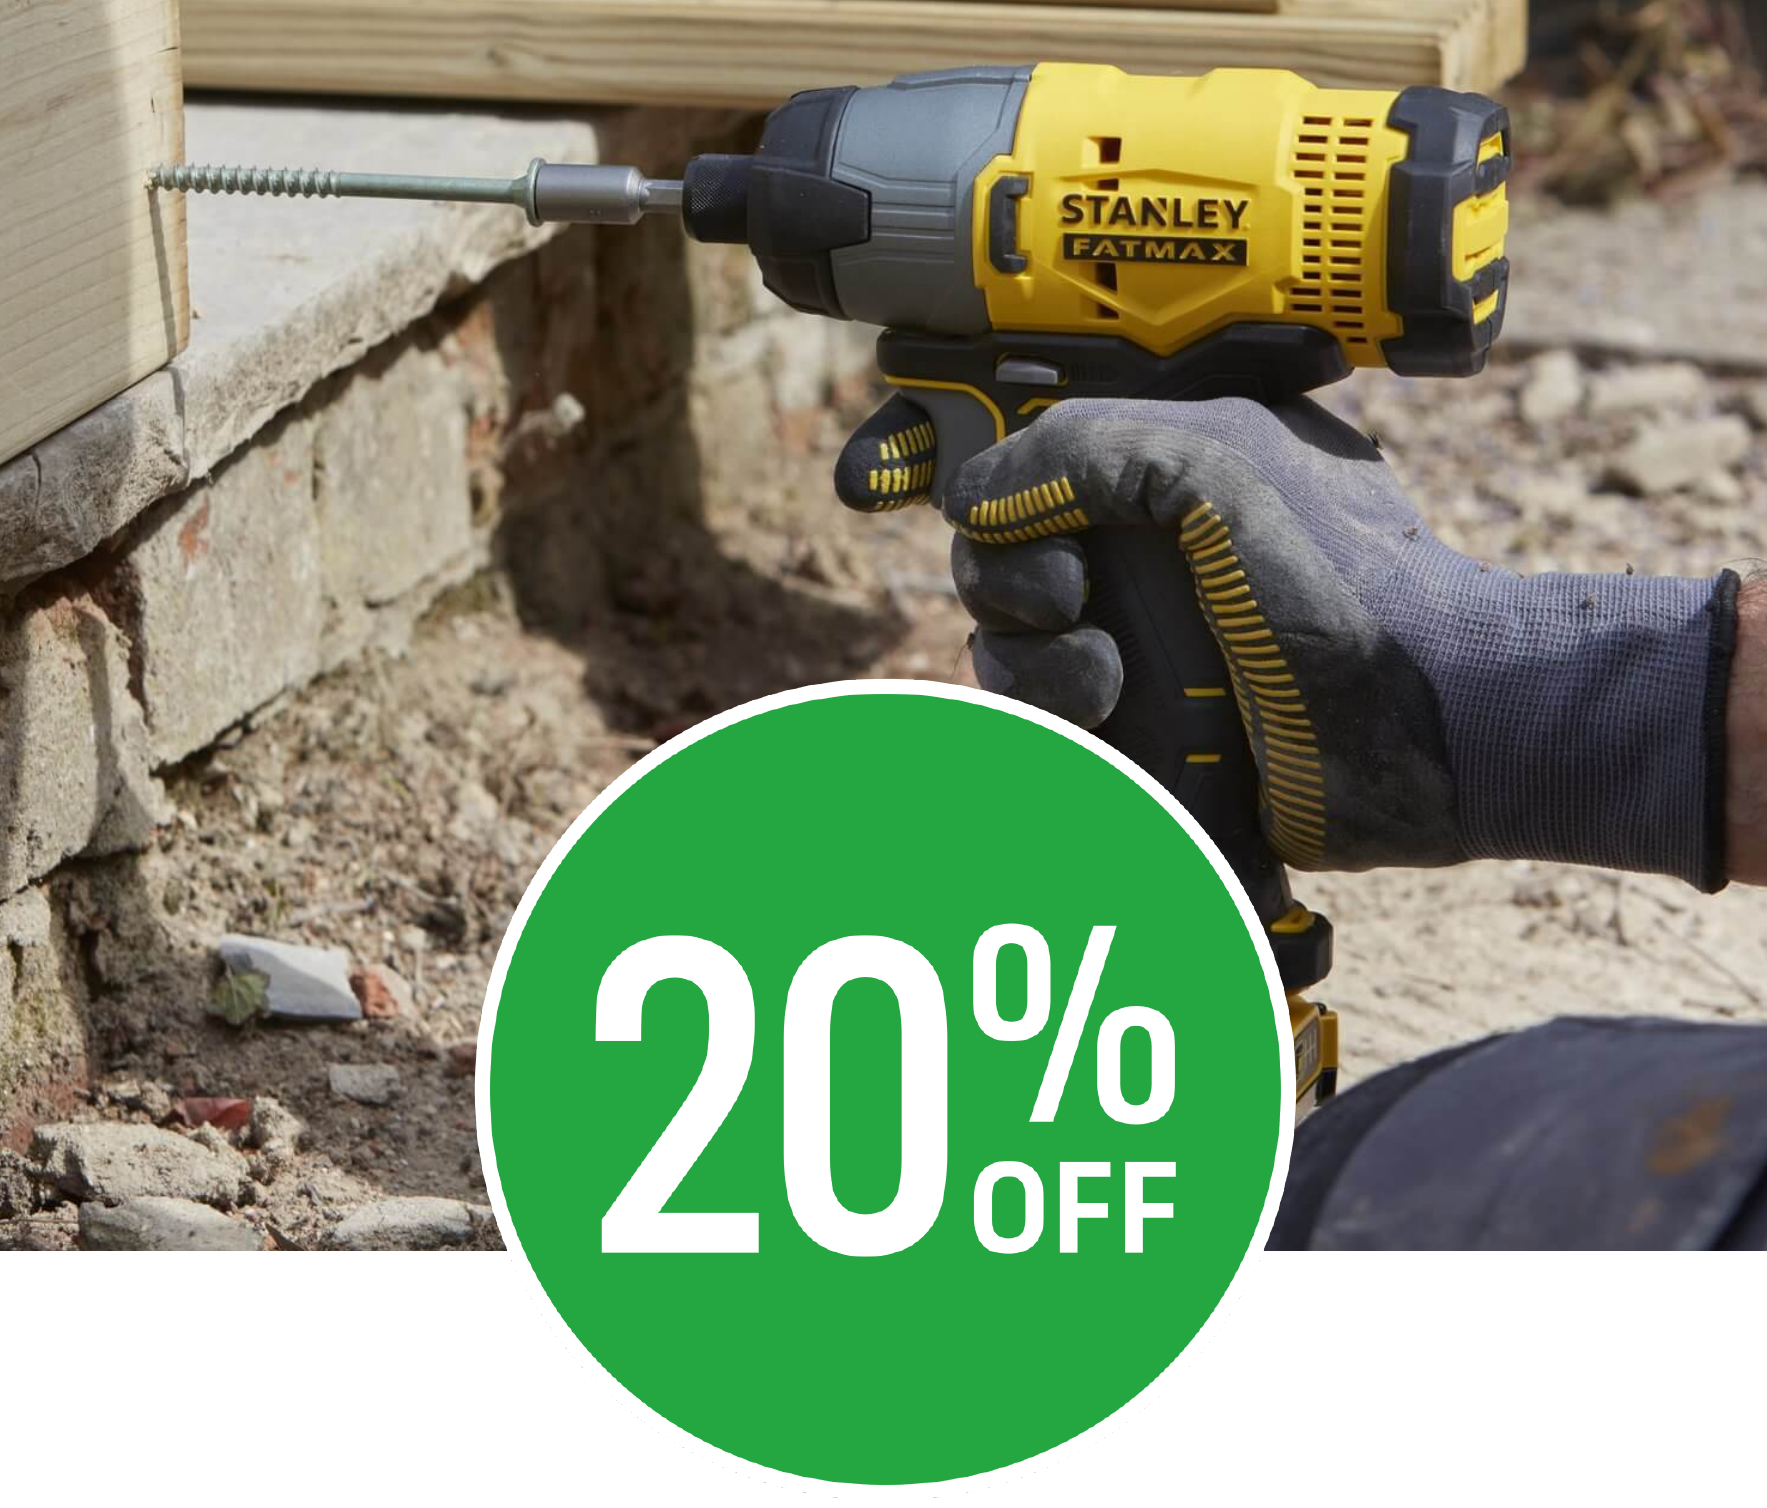 Get 20% off selected Stanley FatMax Power Tools